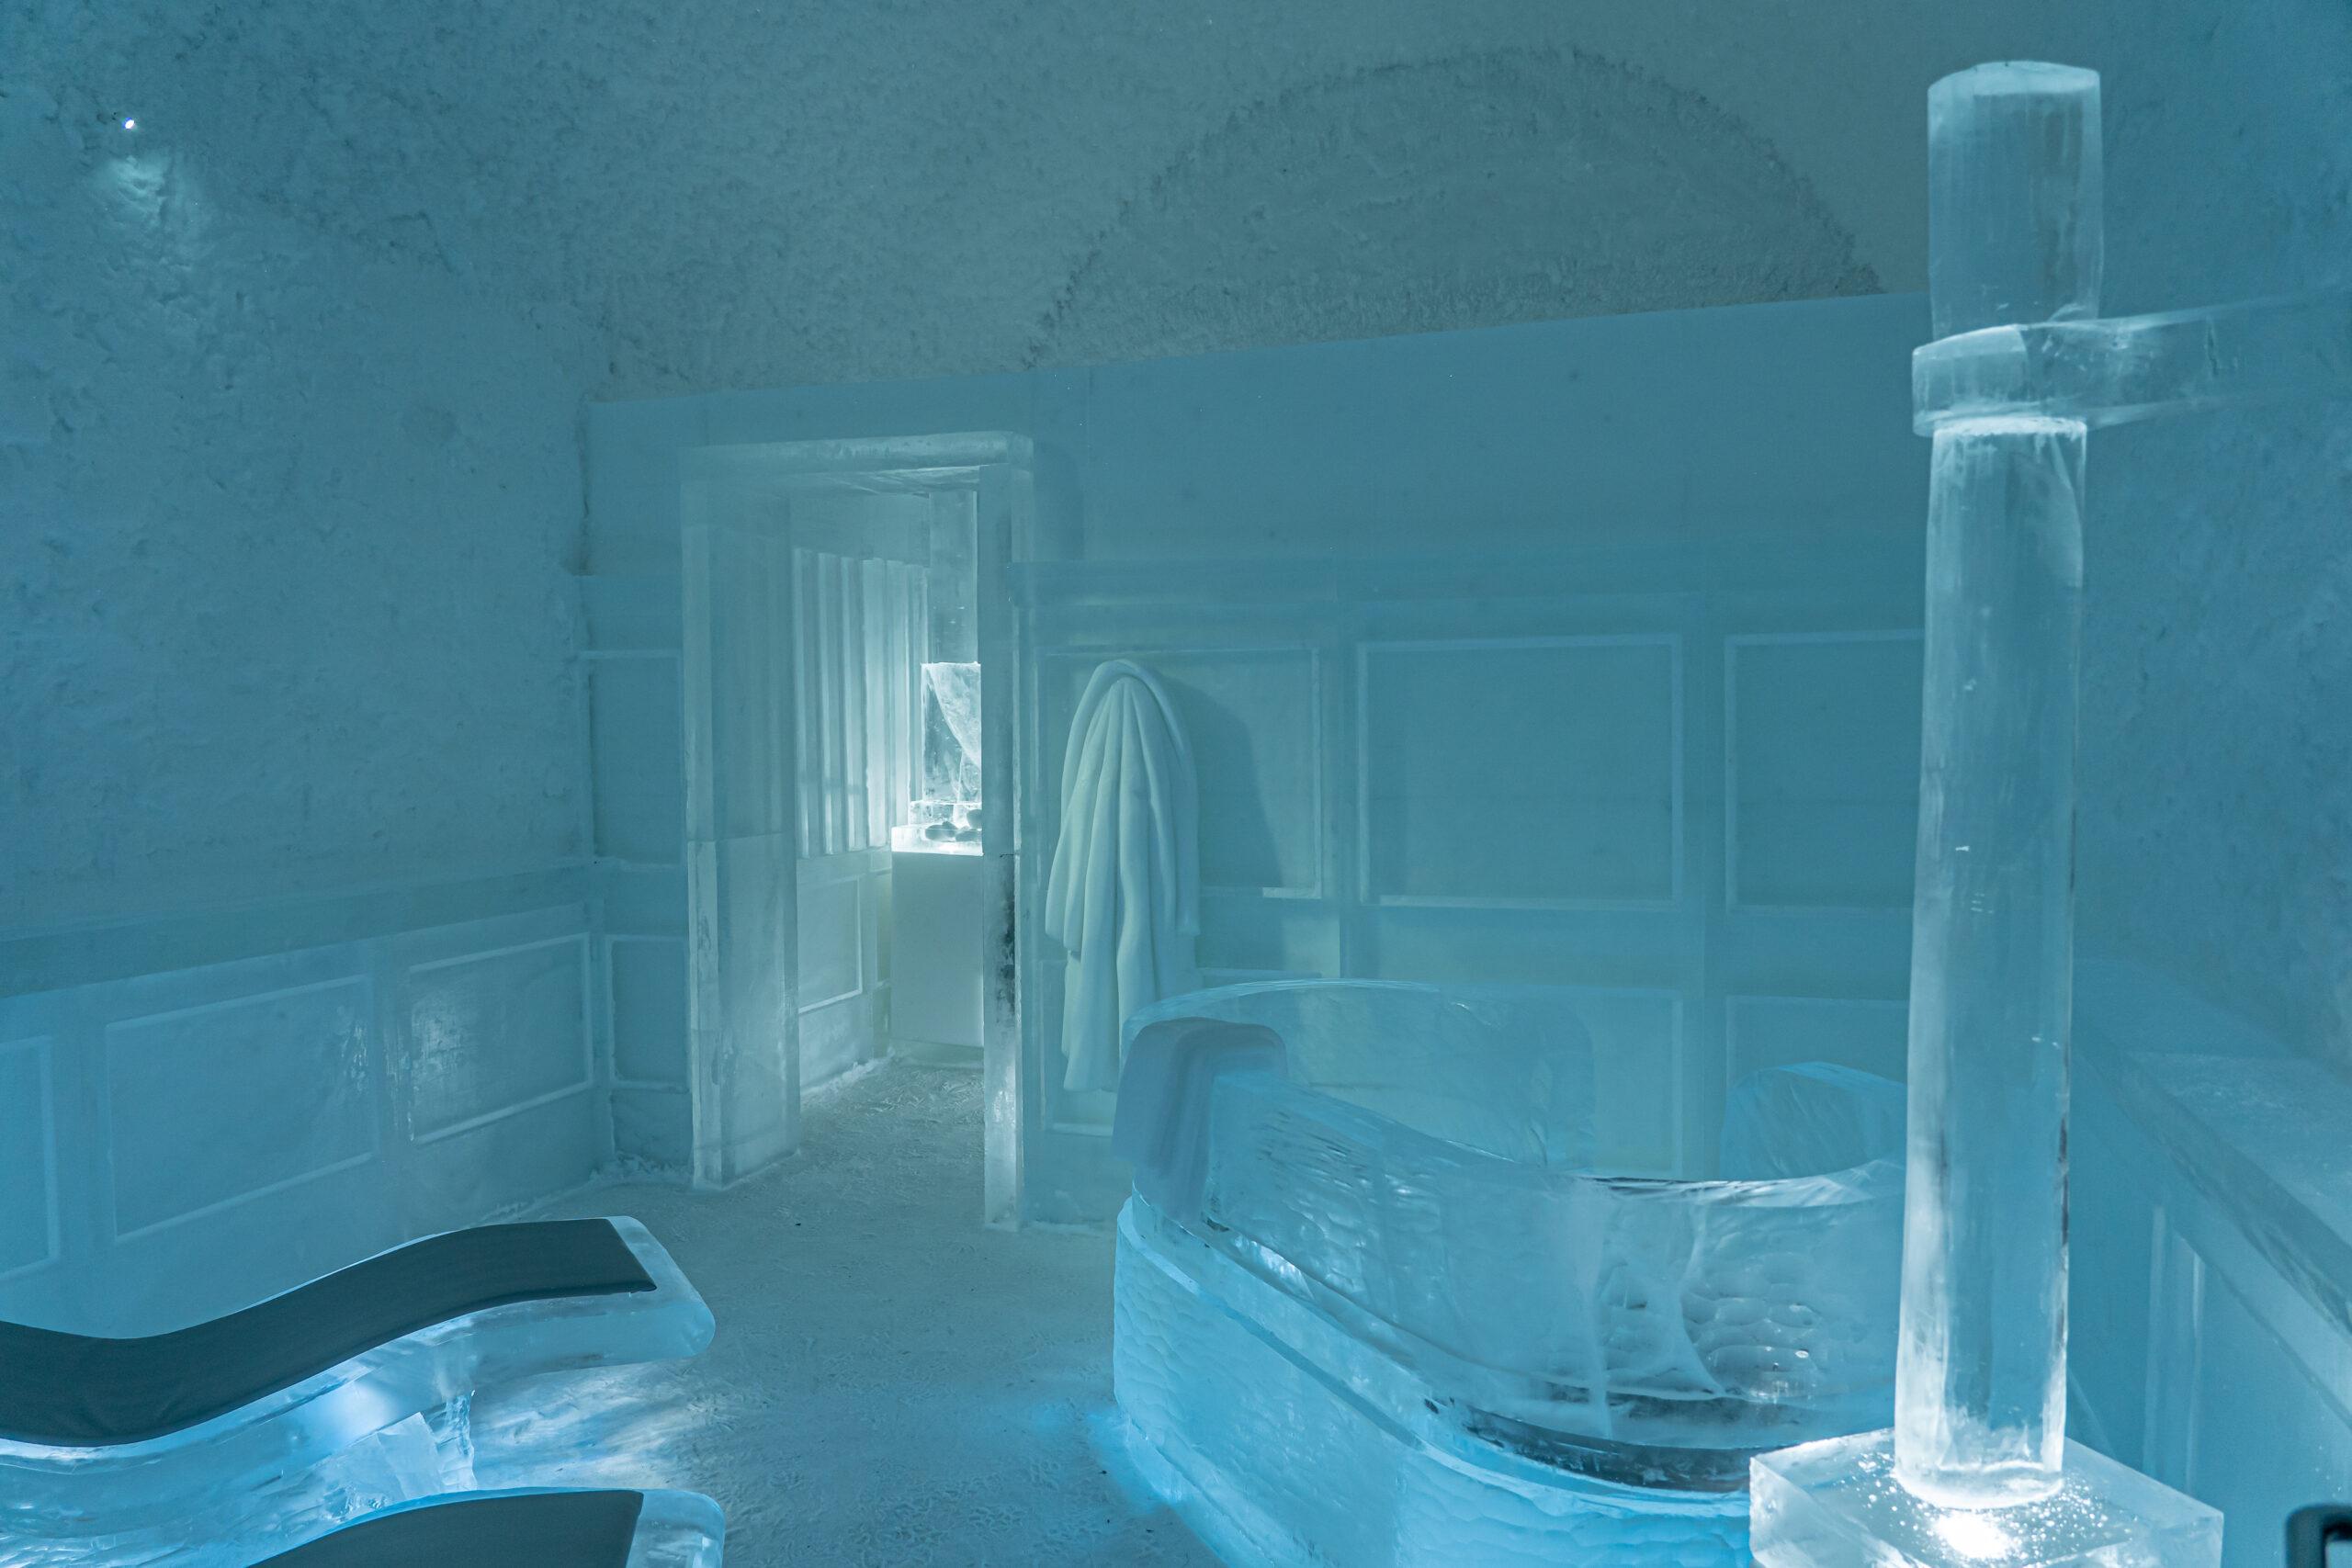 Icehotel x Vagabonds of Sweden